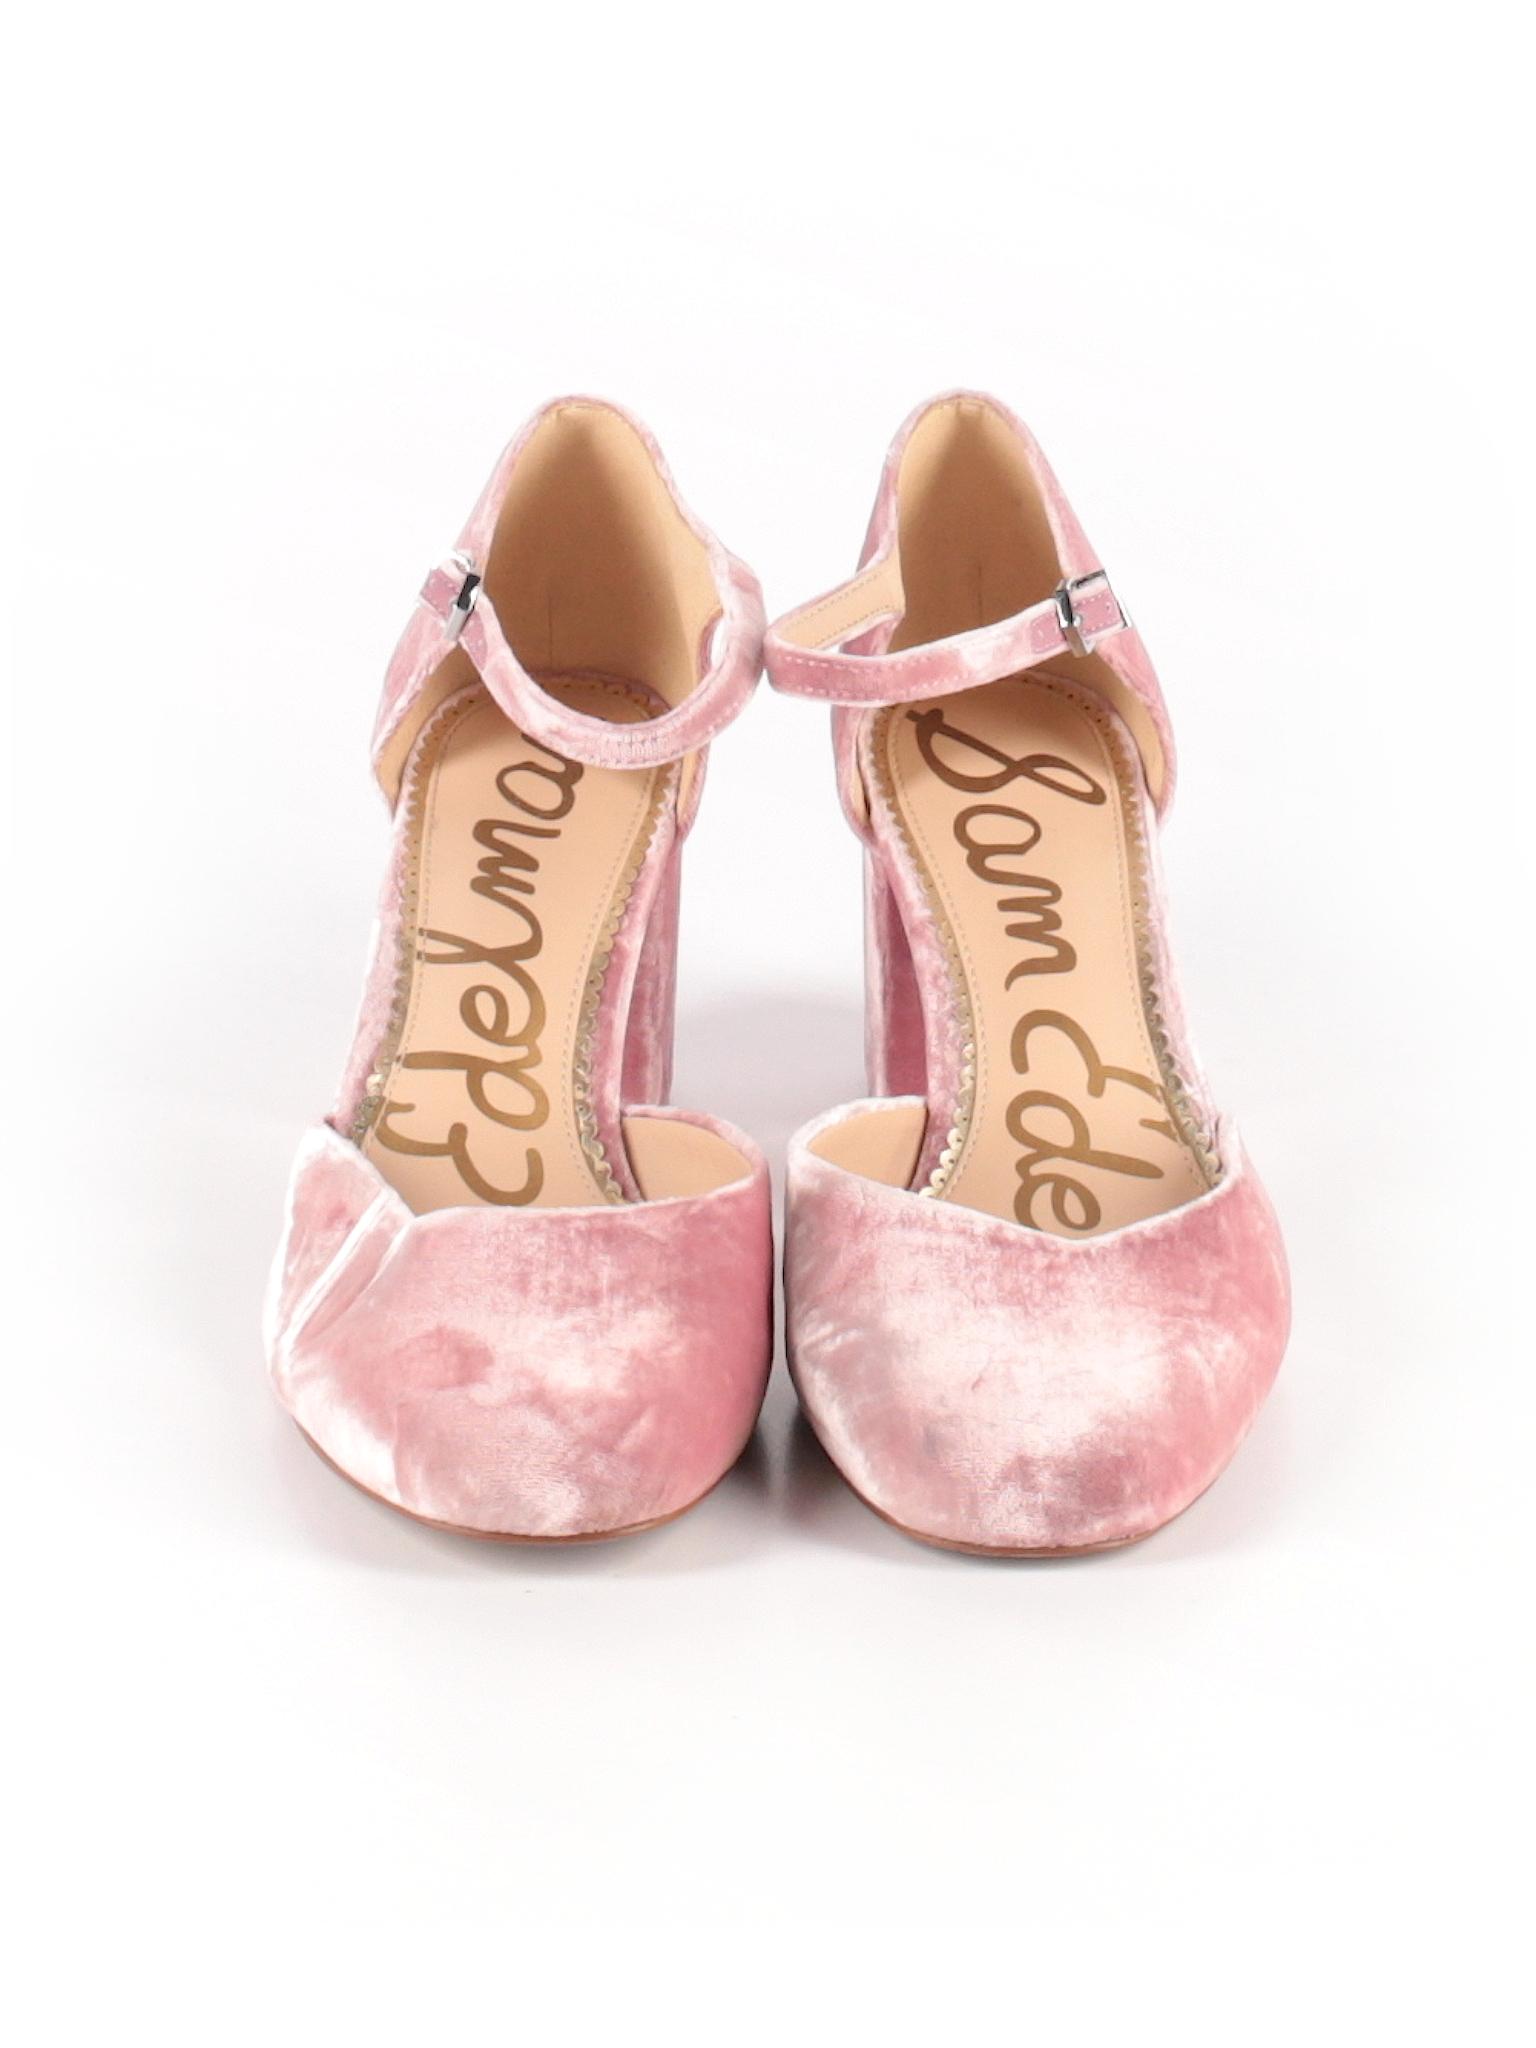 0b5dd9310 Sam Edelman Solid Light Pink Heels Size 11 - 63% off